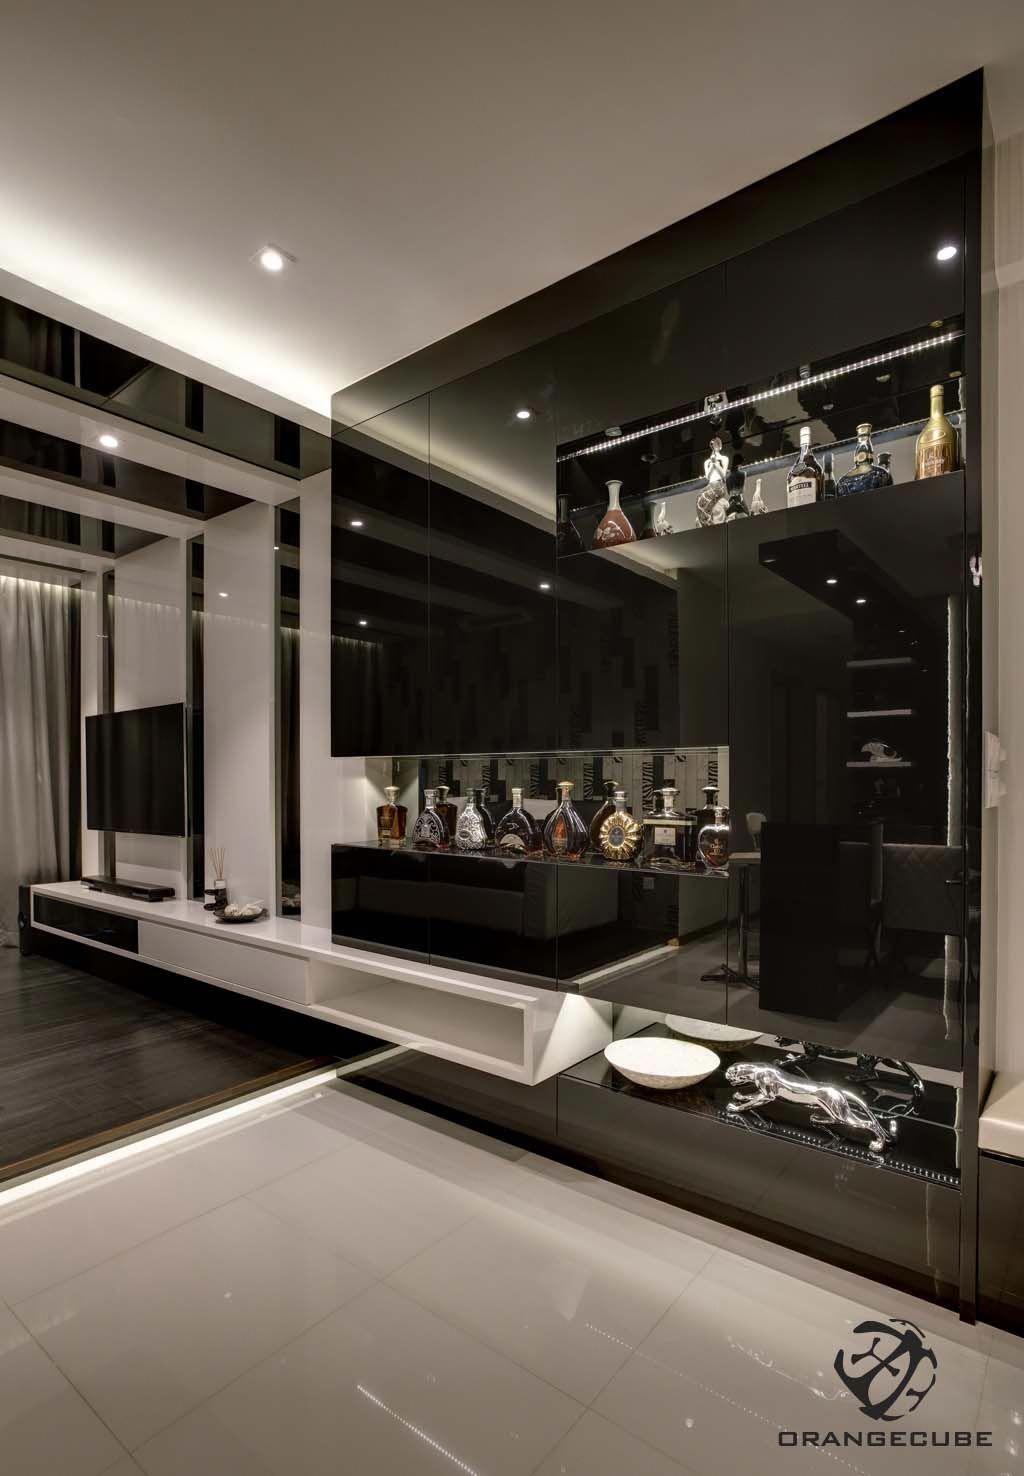 Online home decorating software homedecoratingarticles interiordesignsingapore also rh pinterest